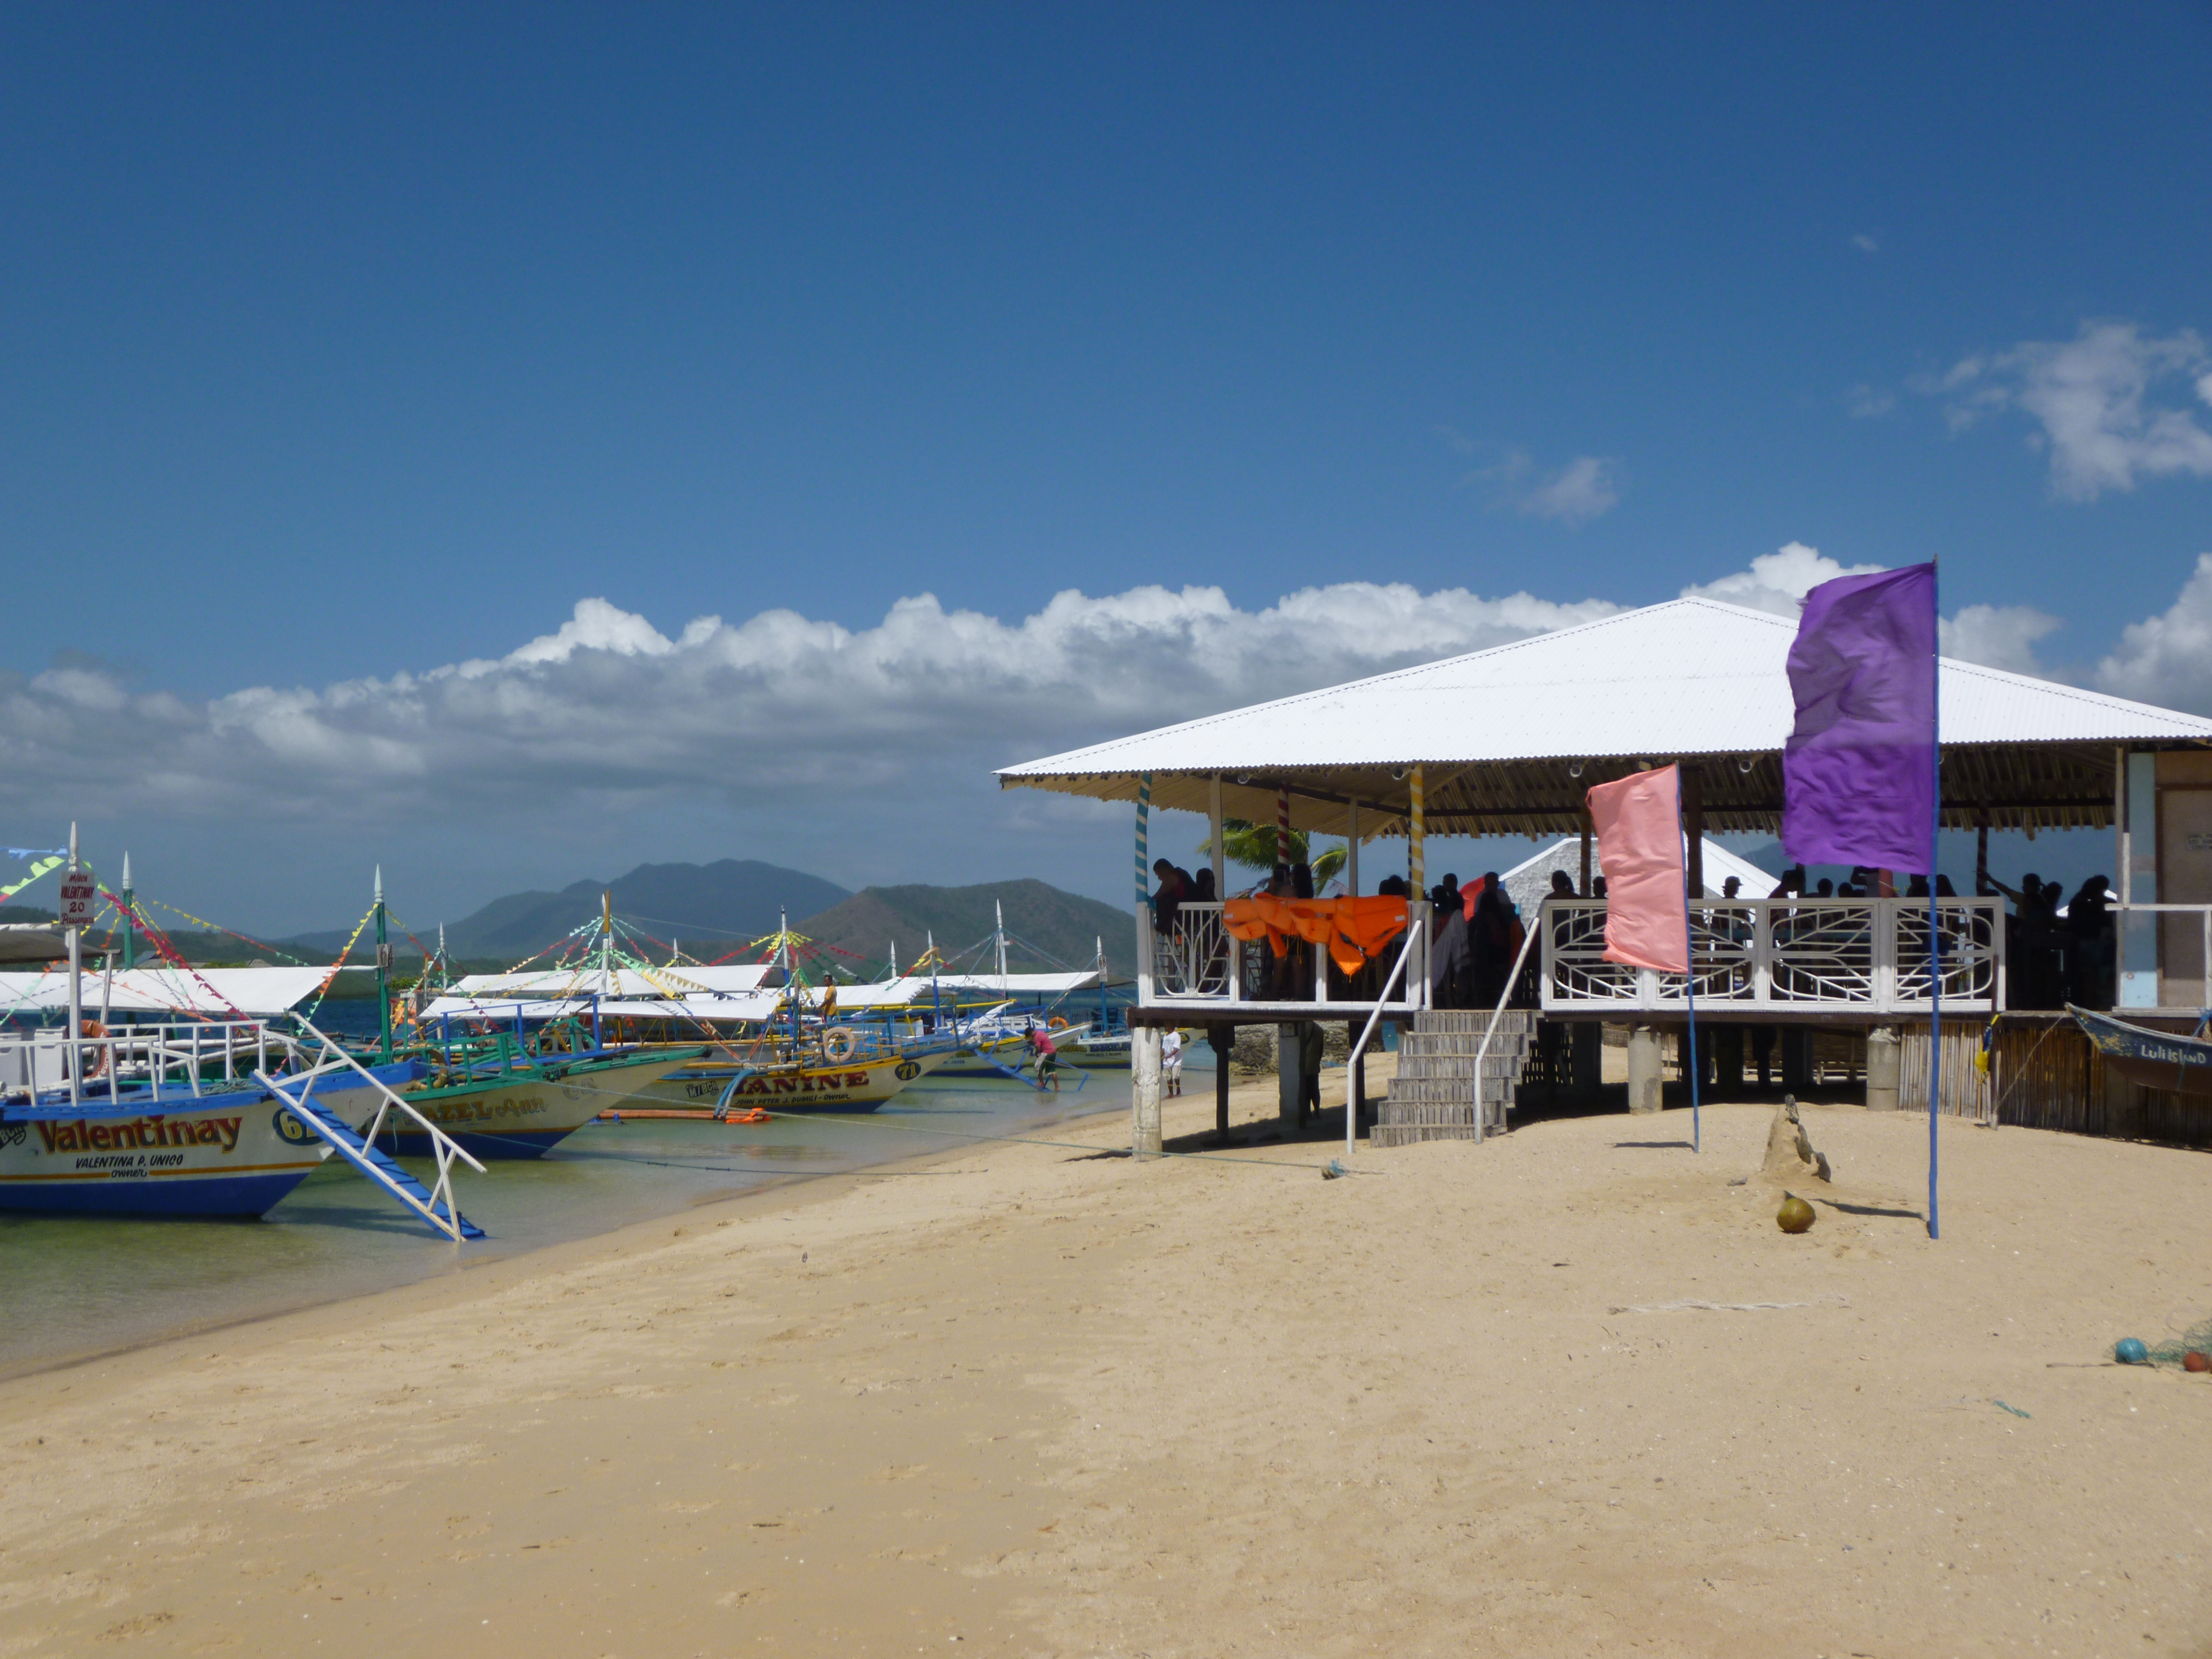 Lulli island